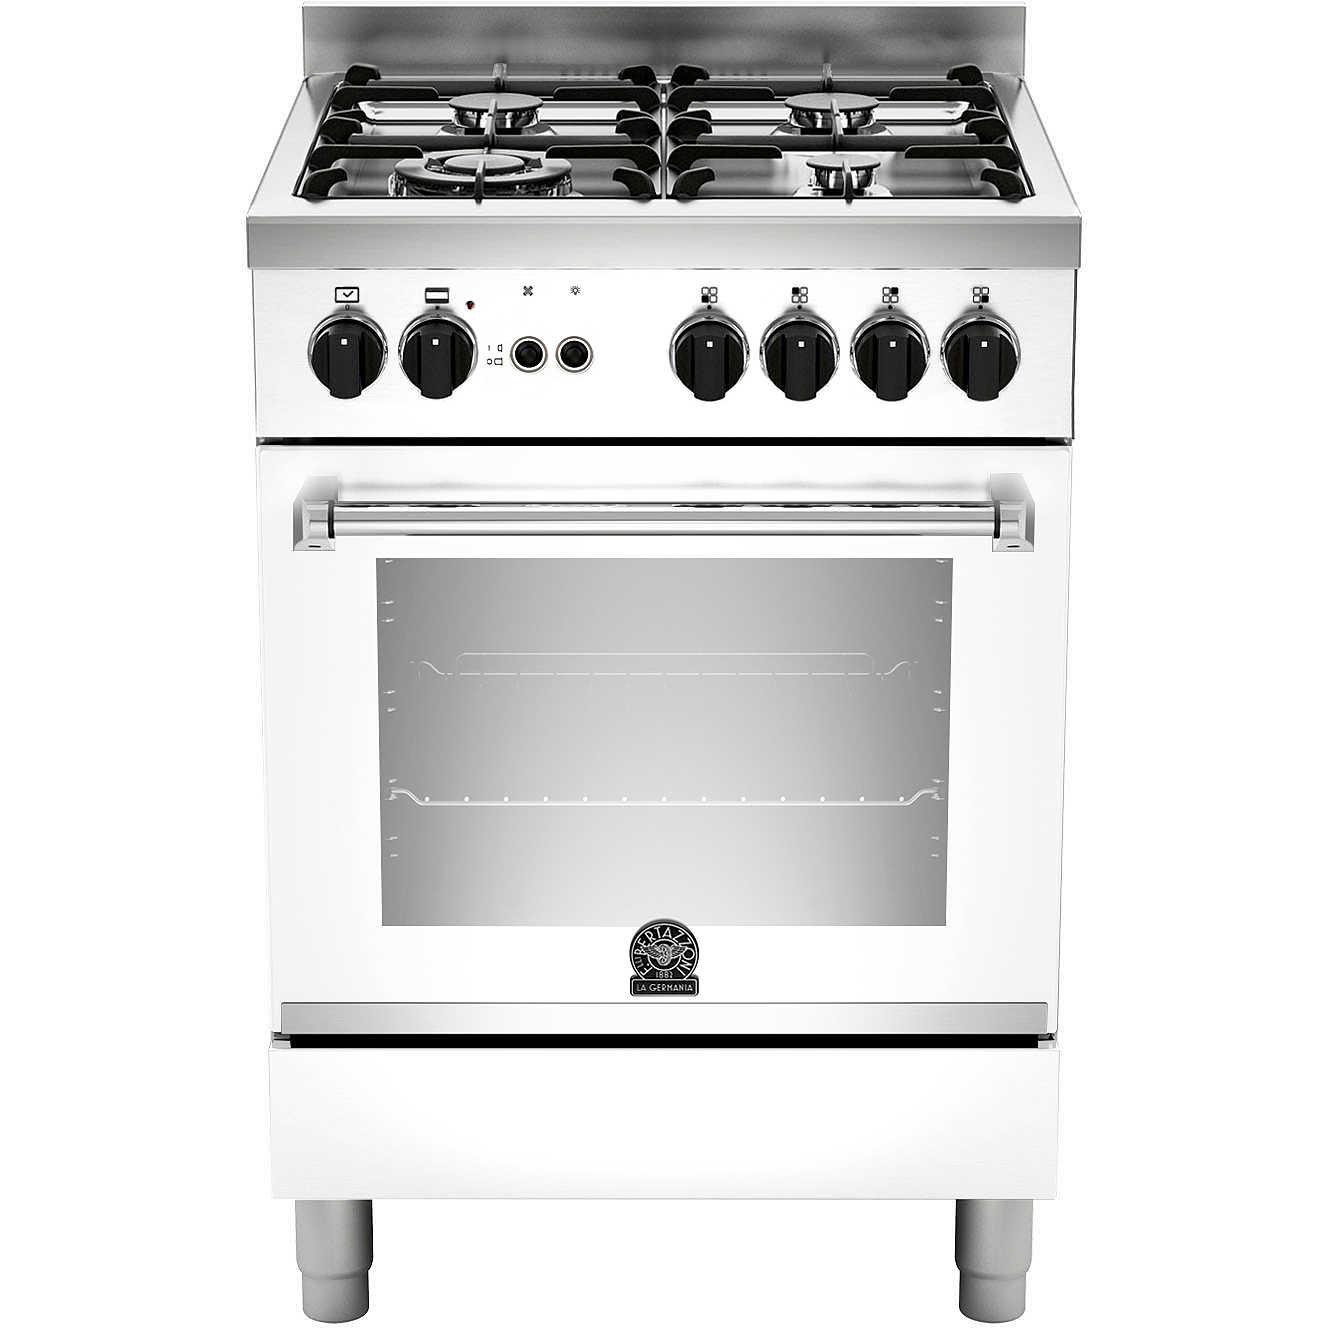 Cucina A Gas Ariston 4 Fuochi. Ariston Indesit Bruciatori Cucina Gas ...